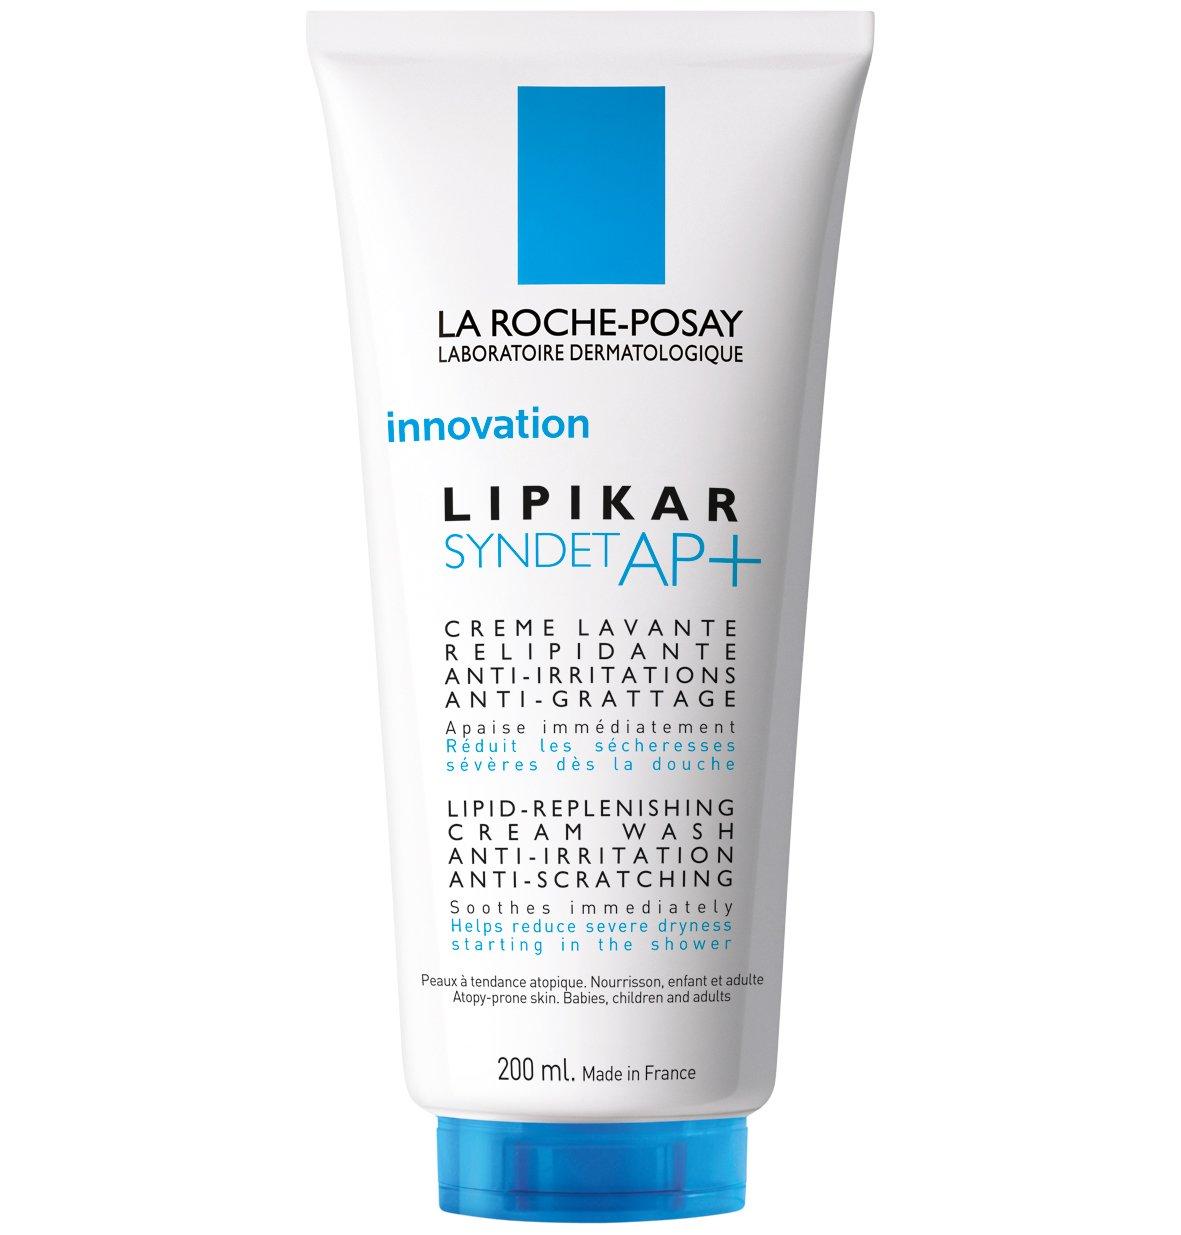 La Roche-Posay Lipikar Syndet AP+ Κρέμα Καθαρισμού για Αναπλήρωση των Λιπιδίων,  υγιεινή   σώμα   ξηροδερμία ψωρίαση